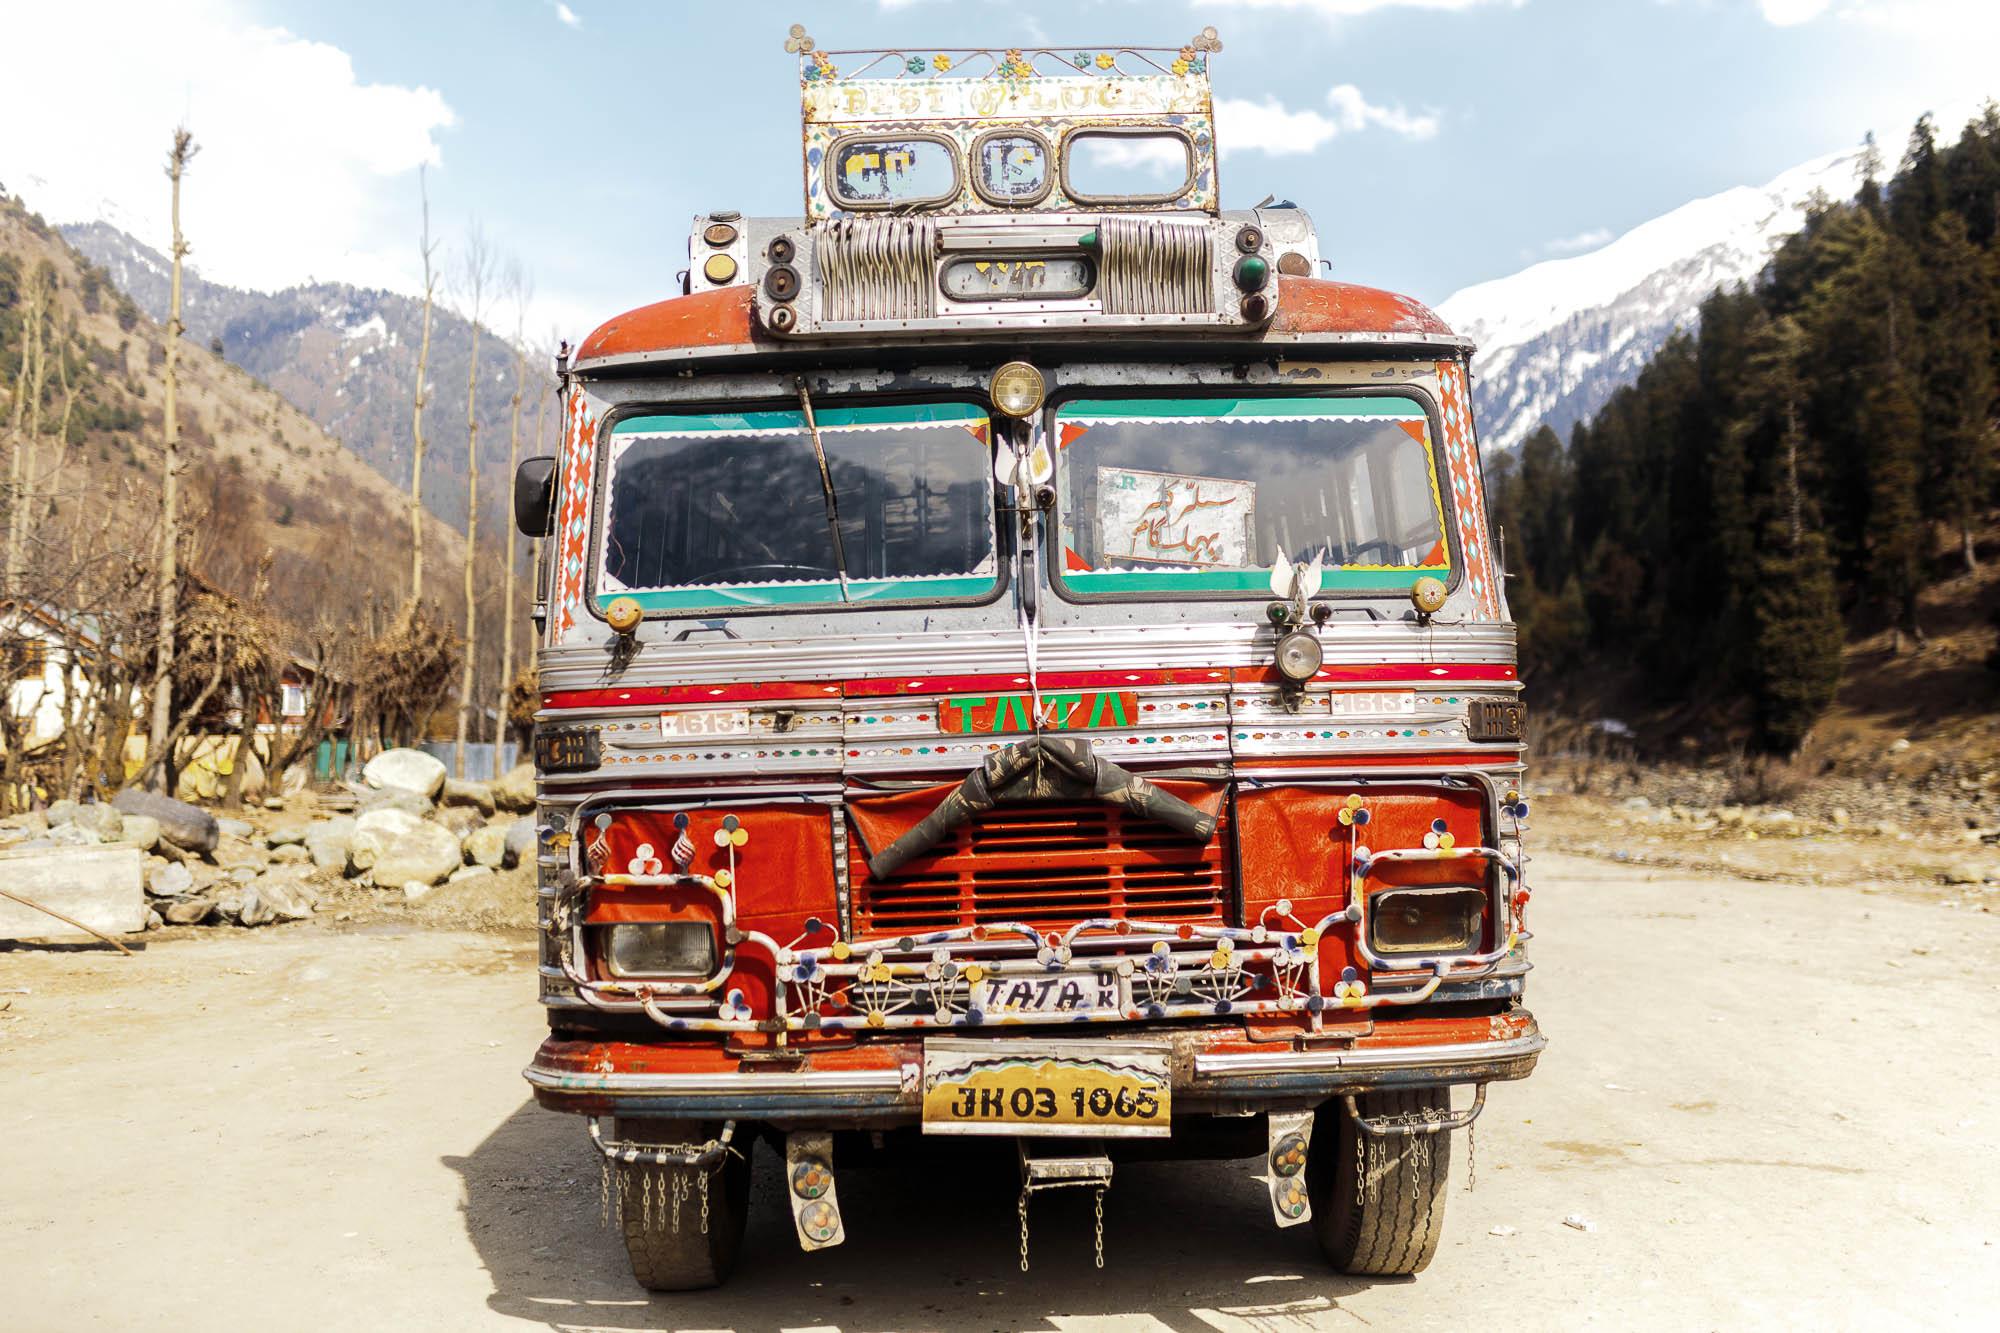 The land of Kashmir